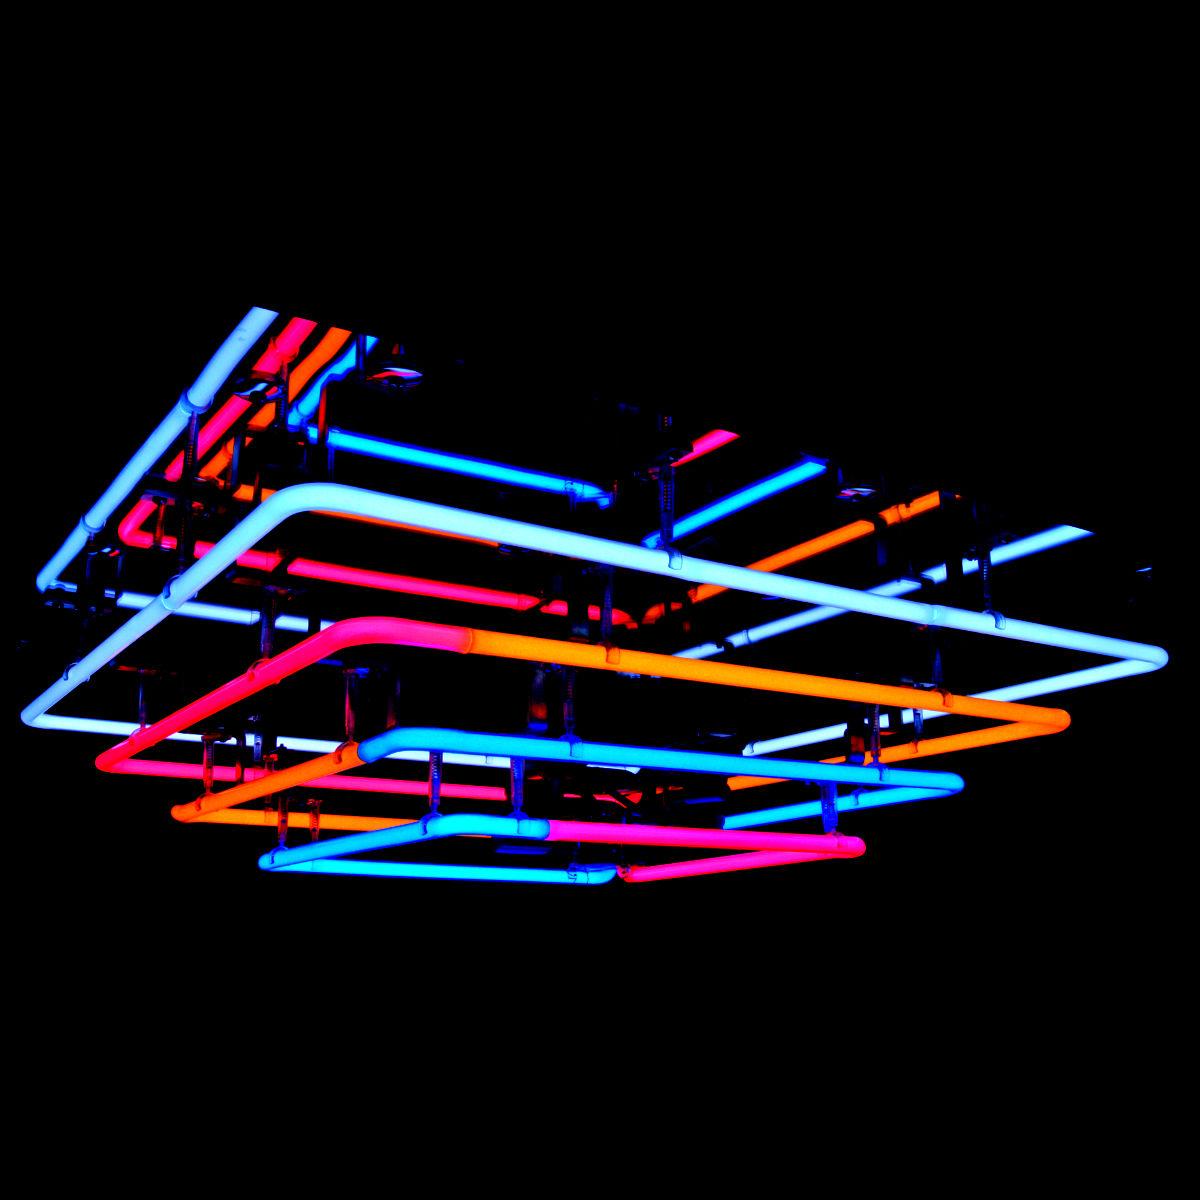 Stunning Mirrored Designer Neon Light Fixtures by John Barton - BartonNeonMagic.com